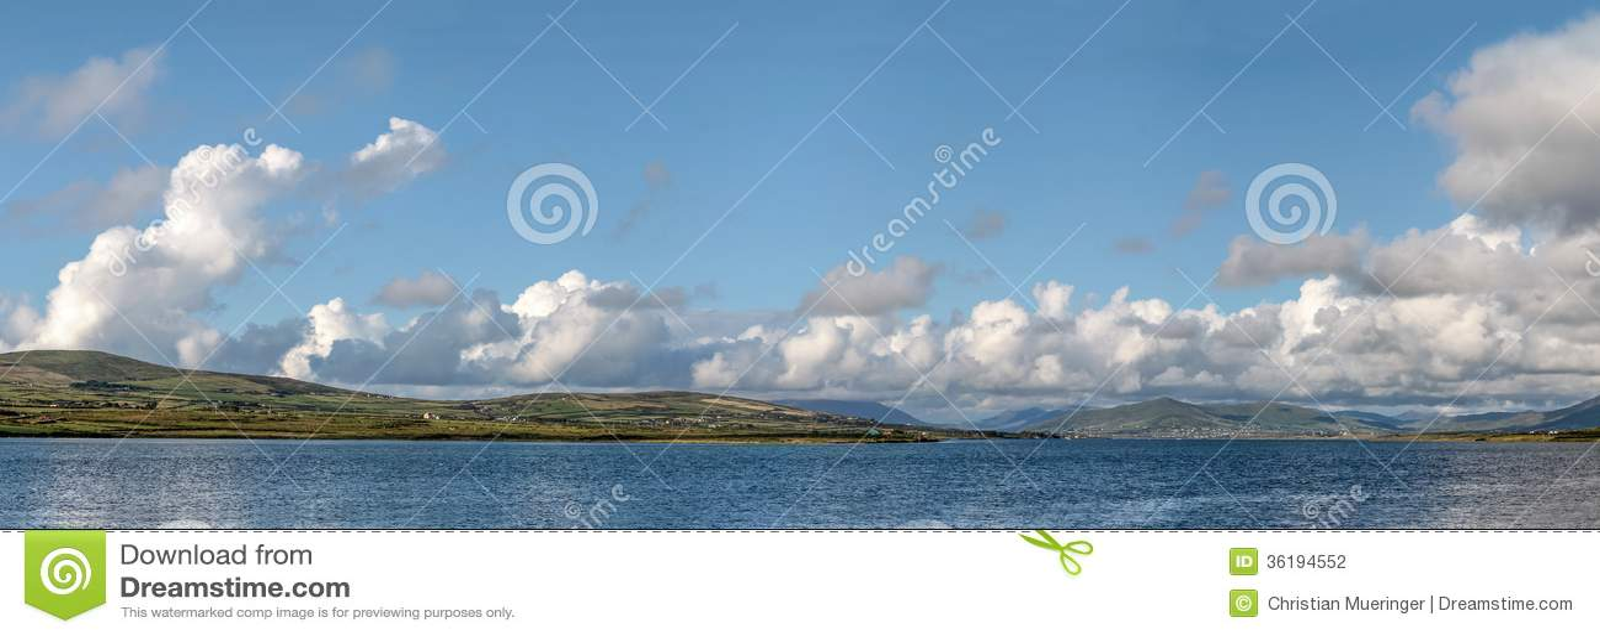 Coastline panorama near Portmagee